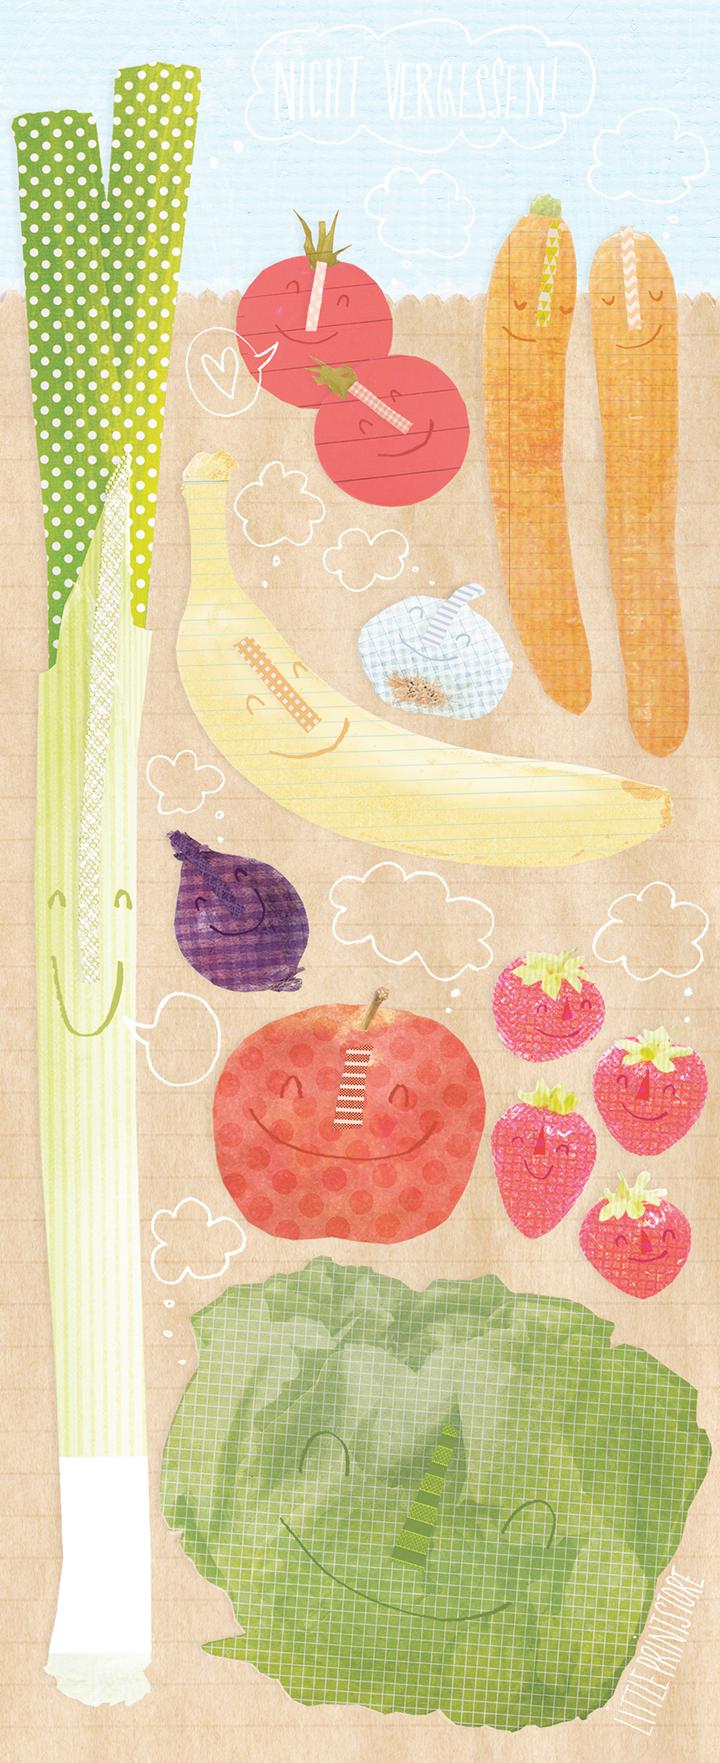 papeterie-illustration-product-design-gemüse-todoblock-einkaufsliste